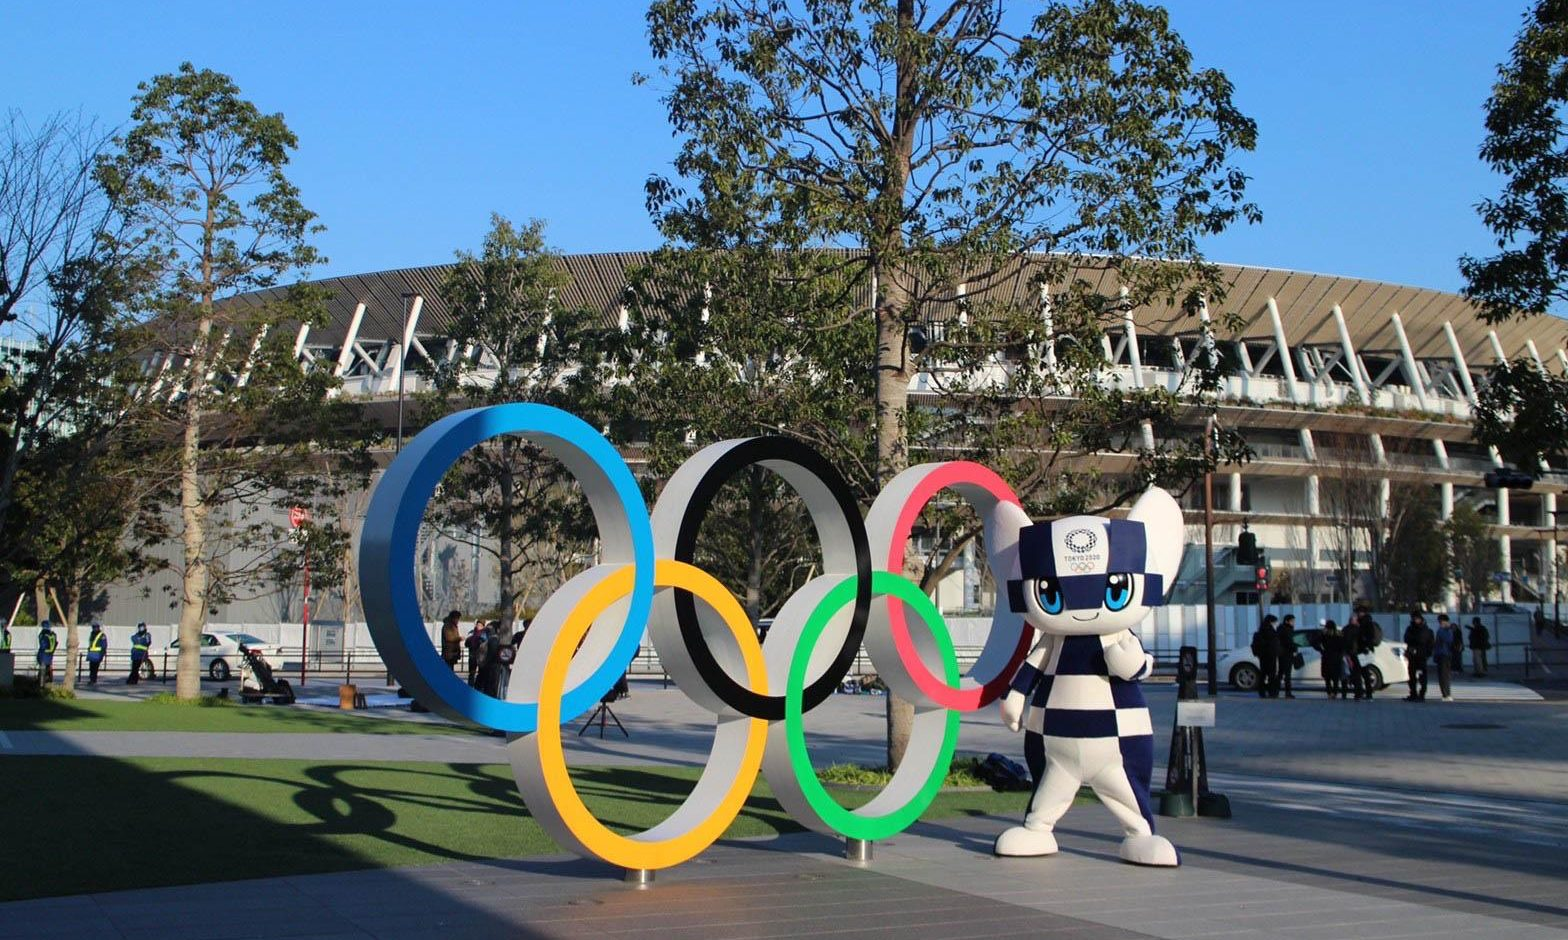 Tóquio 2020 Tóquio-2020 Jogos Olímpicos de Tóquio Olimpíada de Tóquio Estádio Olímpico Anéis Olímpicos